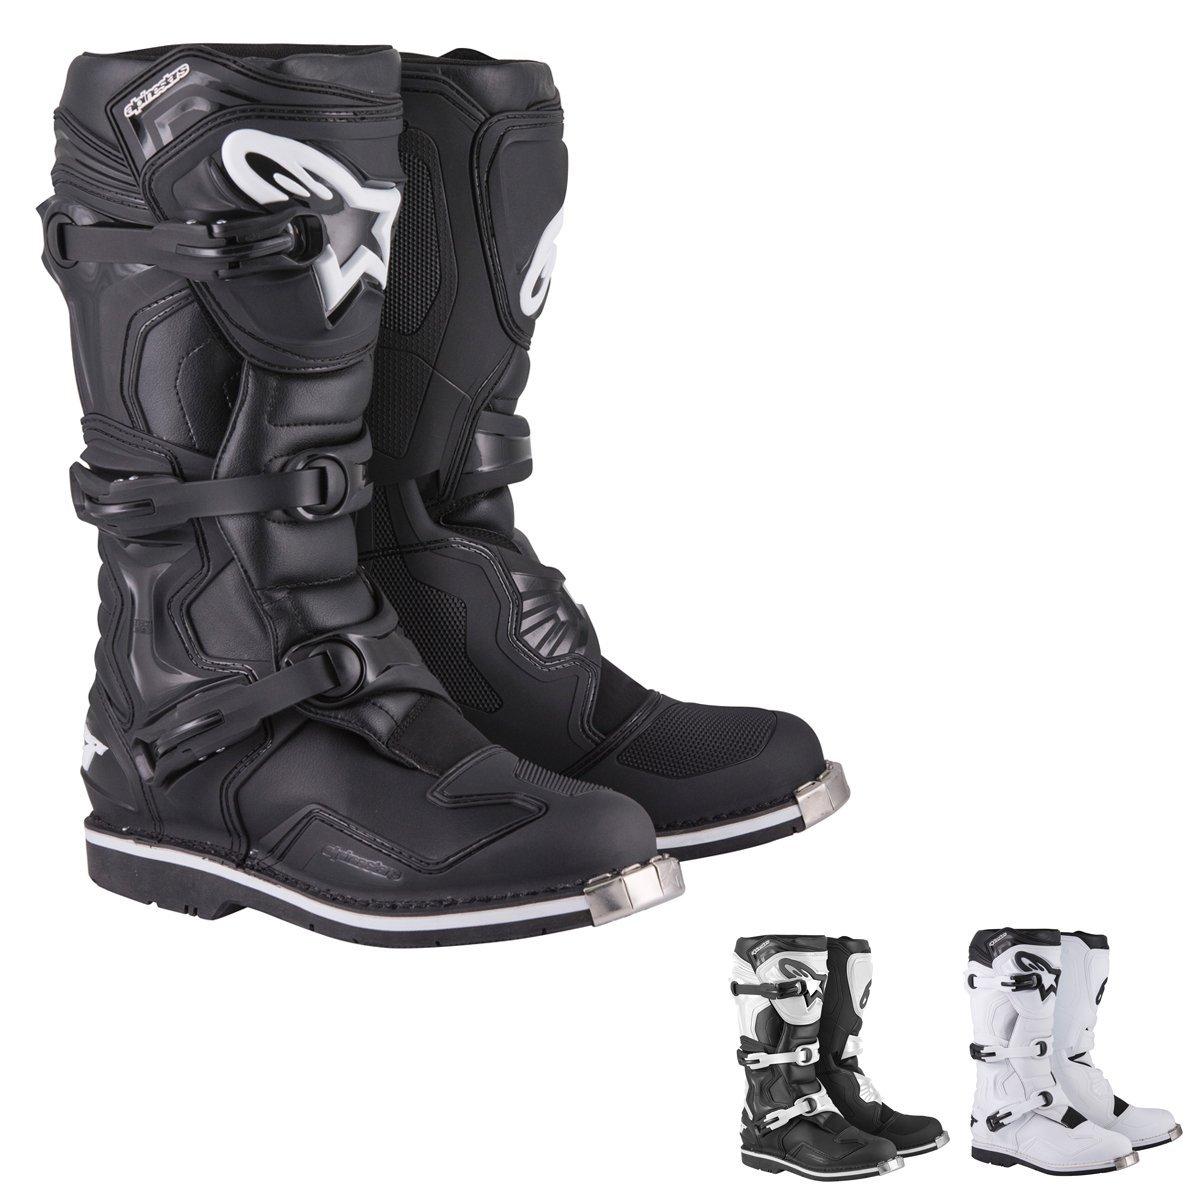 Alpinestars Tech 1 Men's Off-Road Motorcycle Boots - Black/White / 13